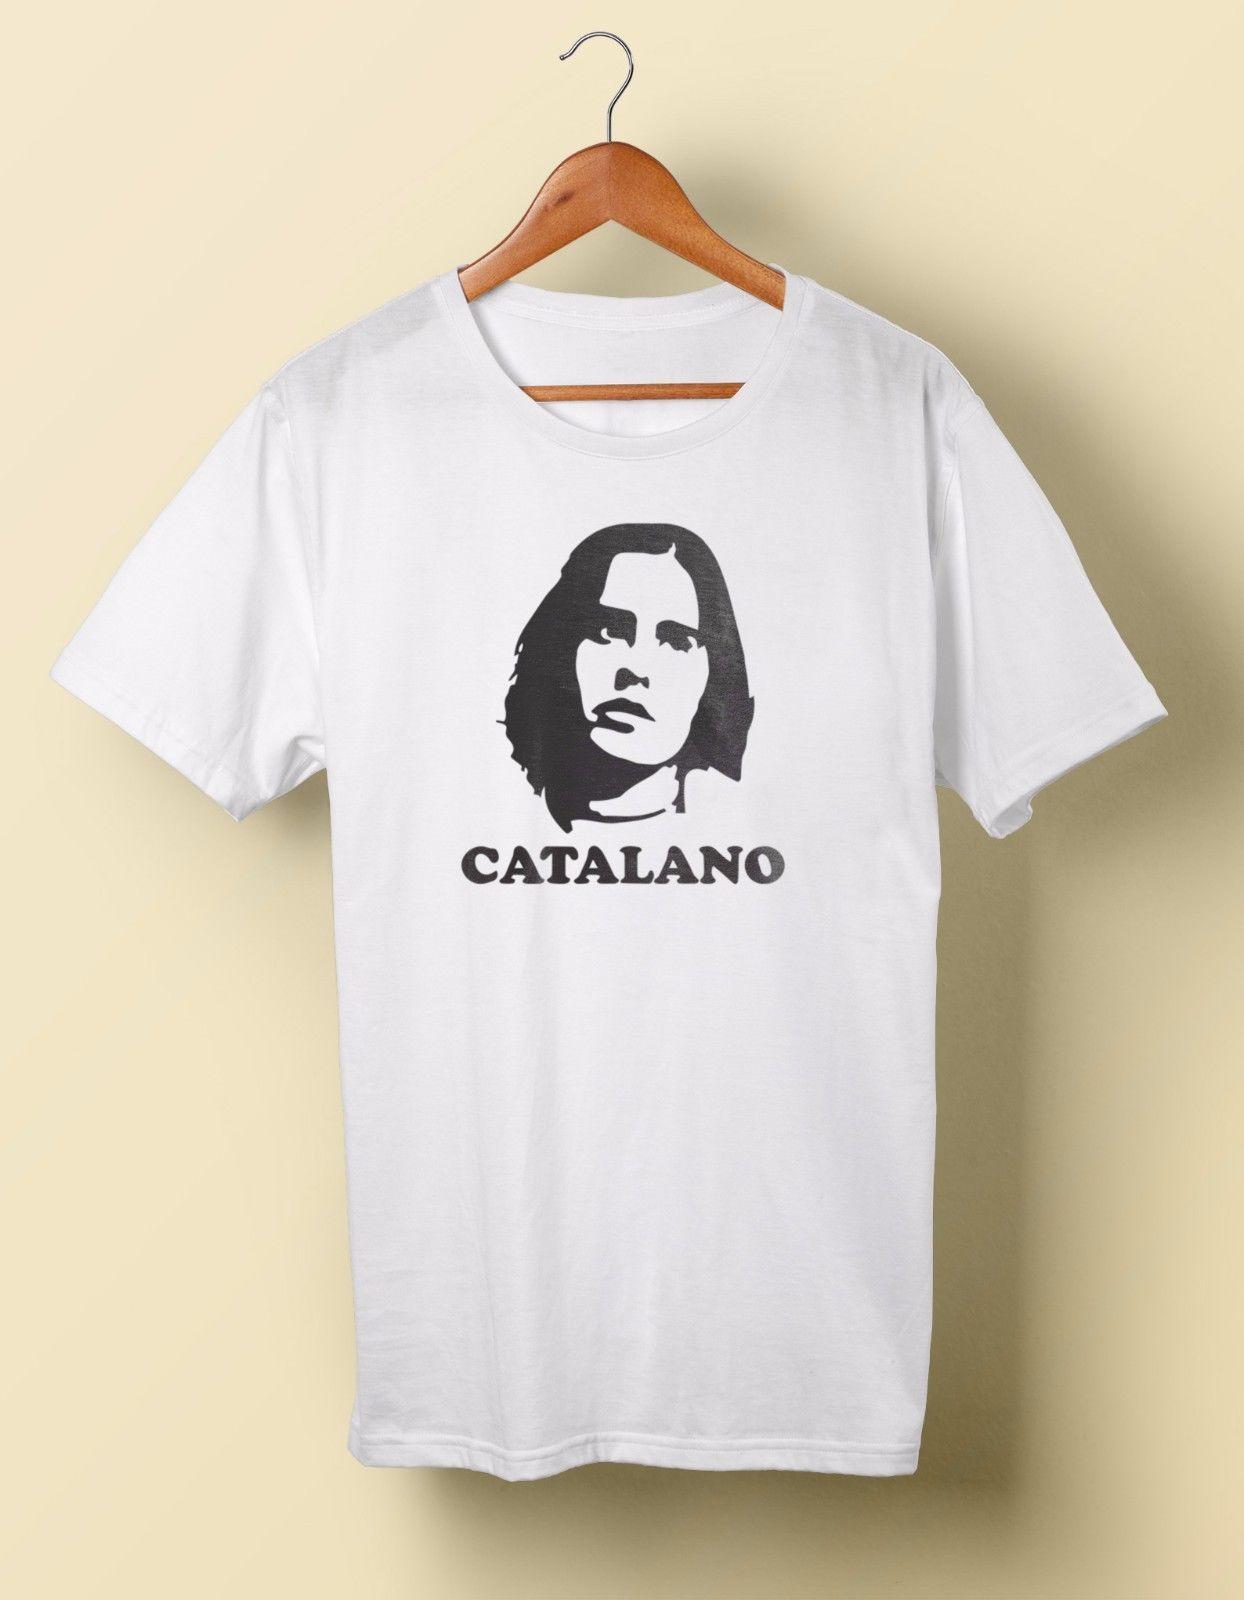 jordan catalano shirt Jared Leto My So